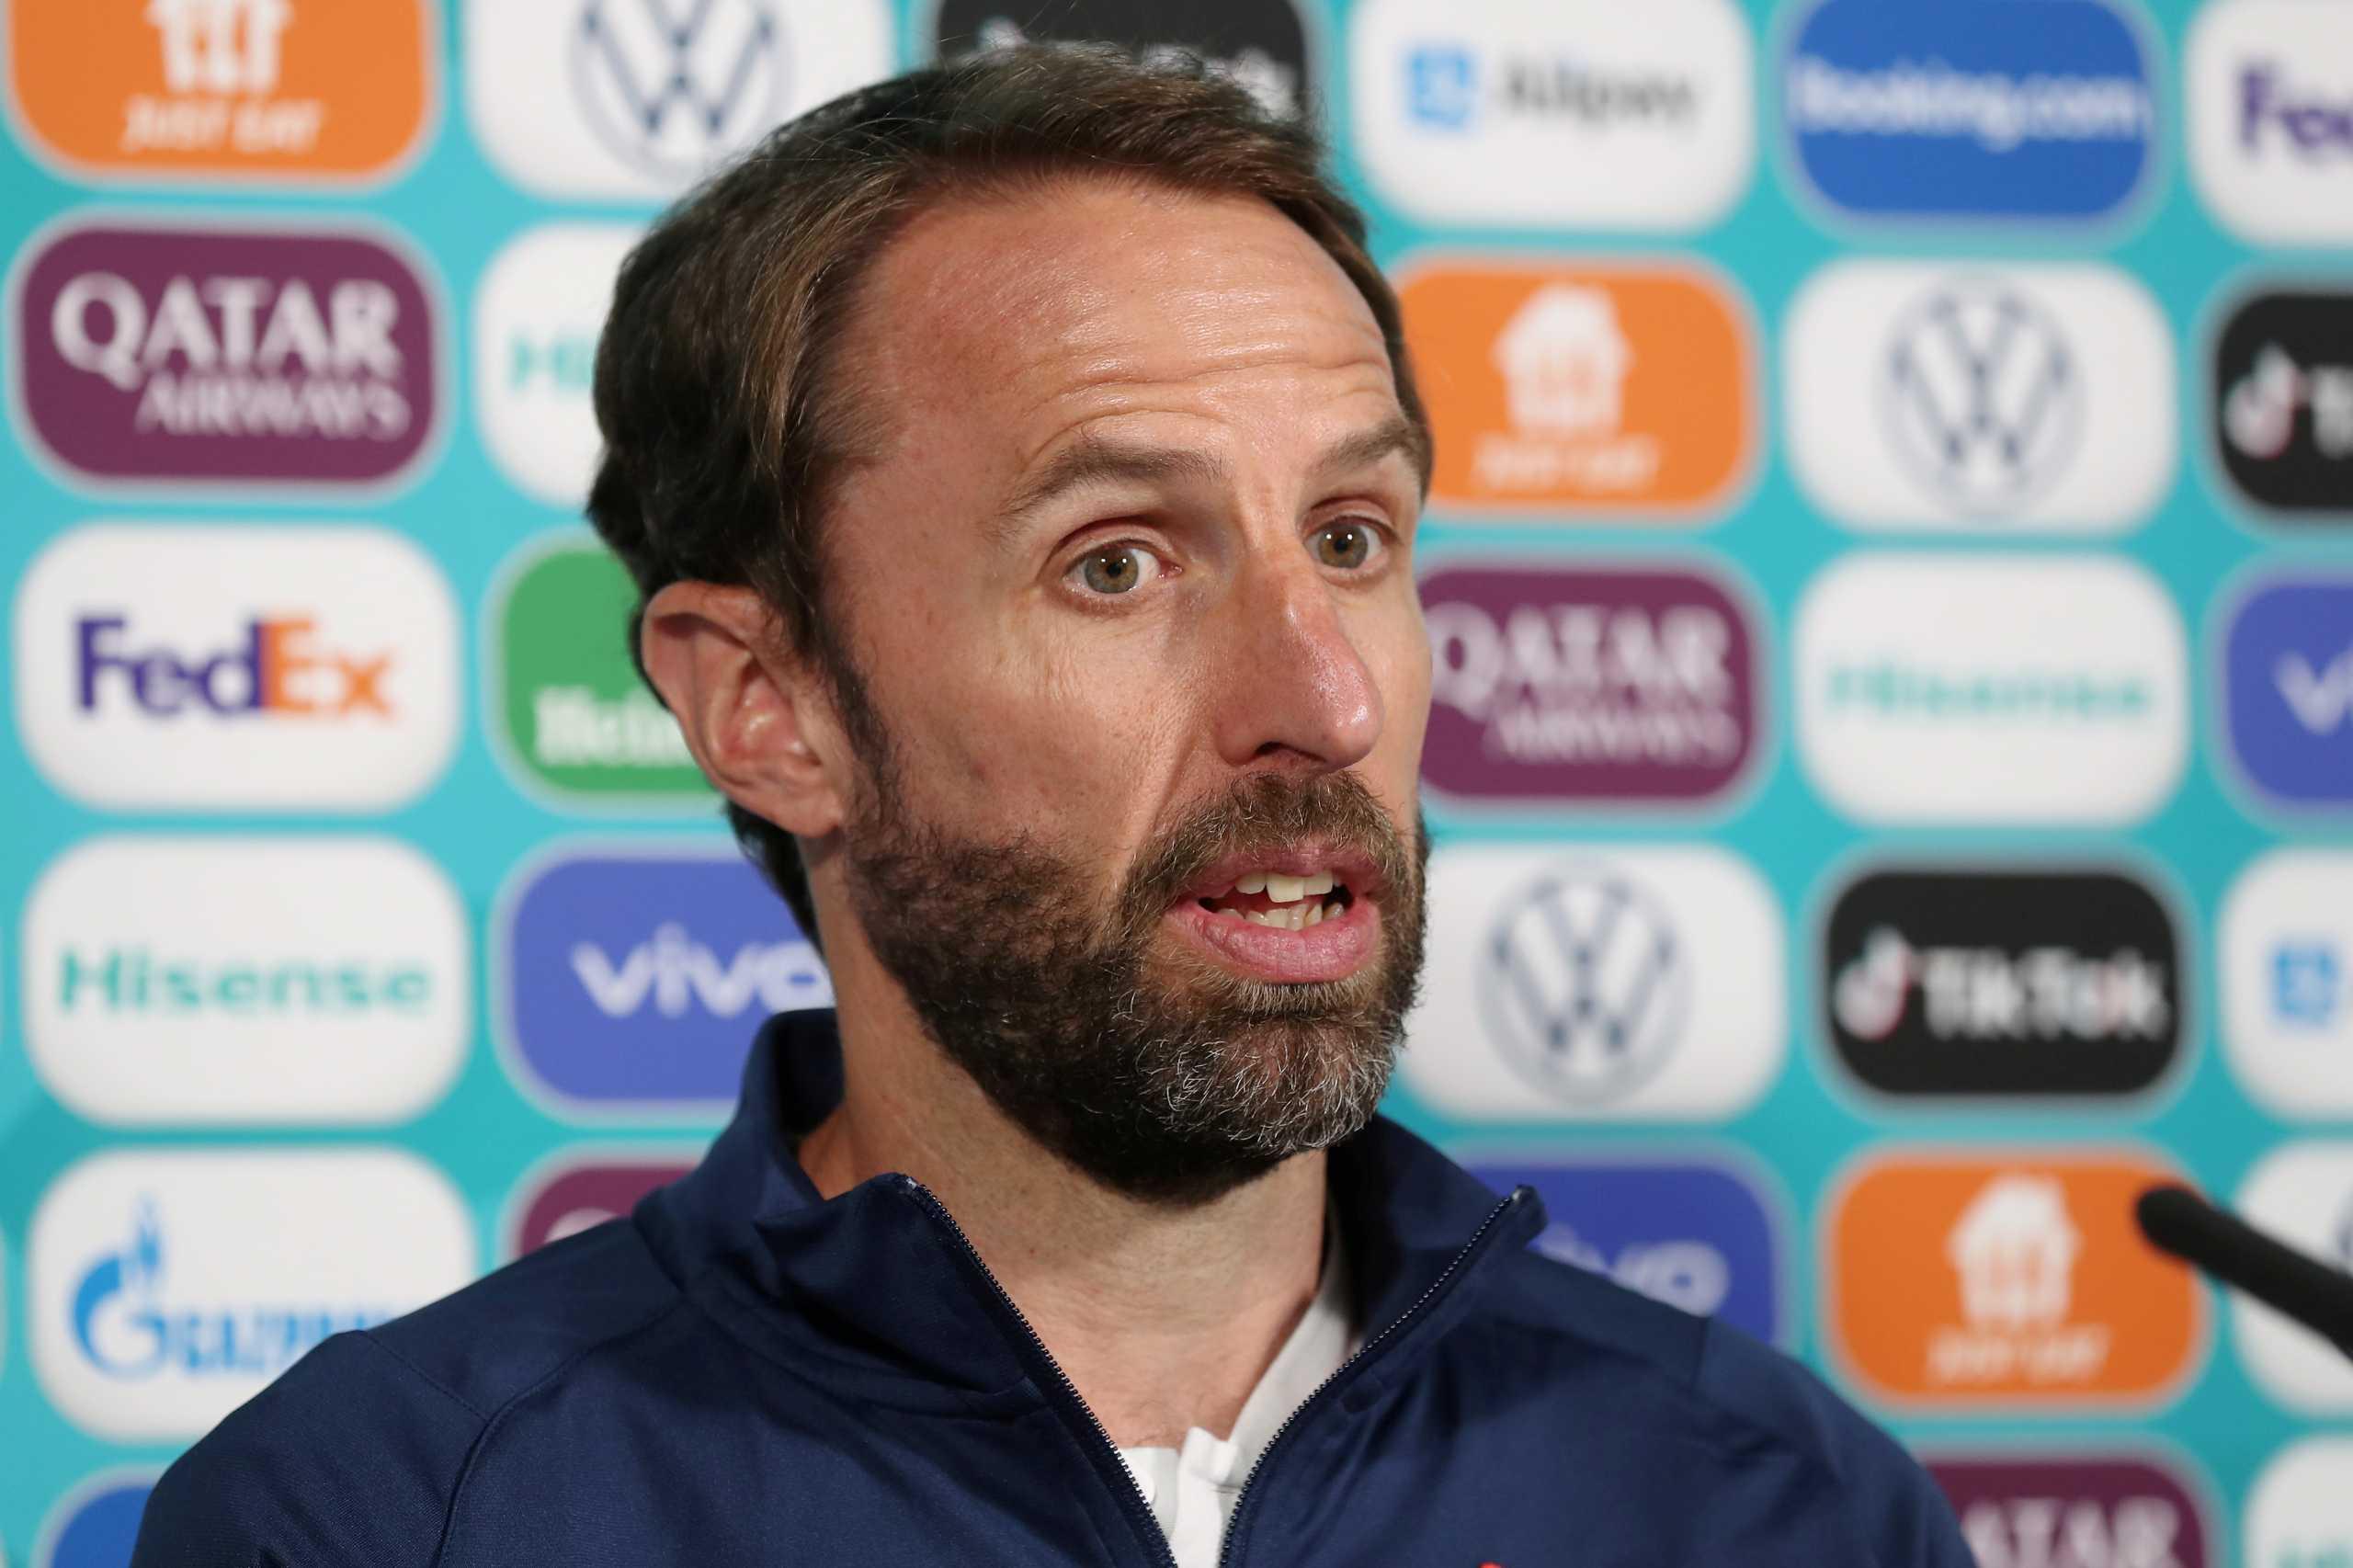 Euro 2020, Σάουθγκεϊτ: «Όπως σε κάθε ματς έτσι και στον τελικό» – Το σχόλιο για το «Three Lions»